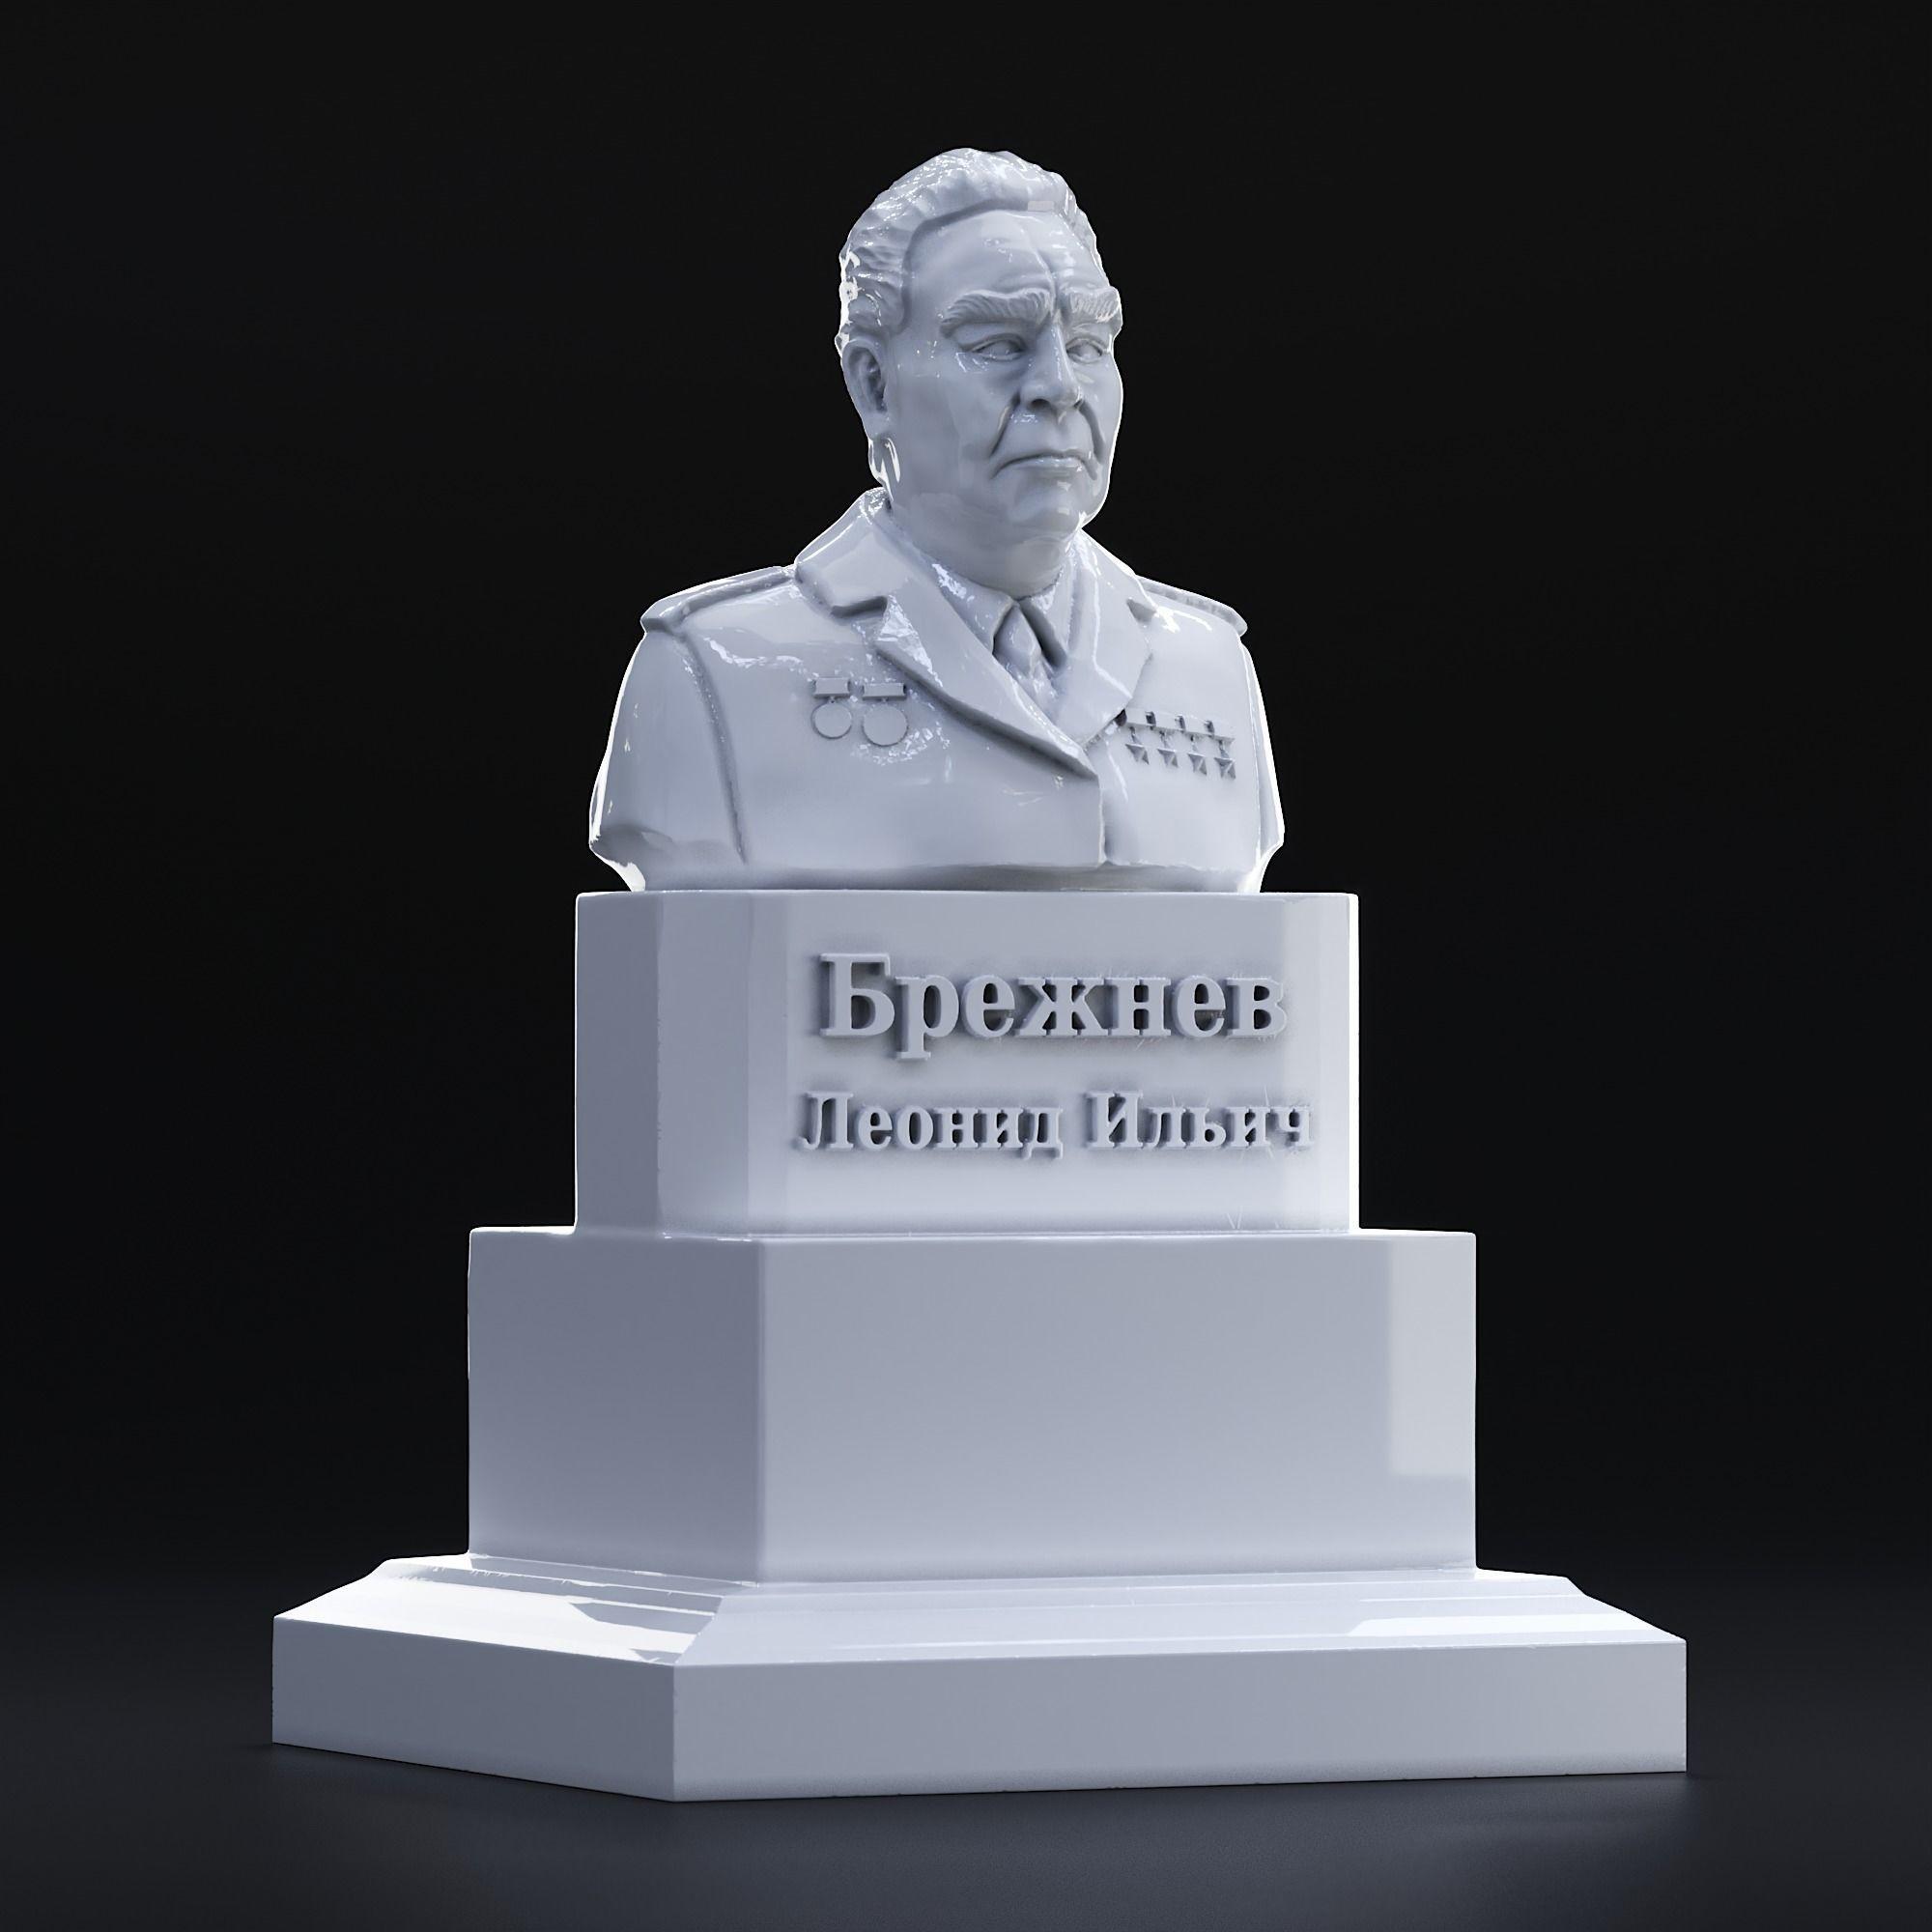 Sculpture of Brezhnev Leonid Ilyich